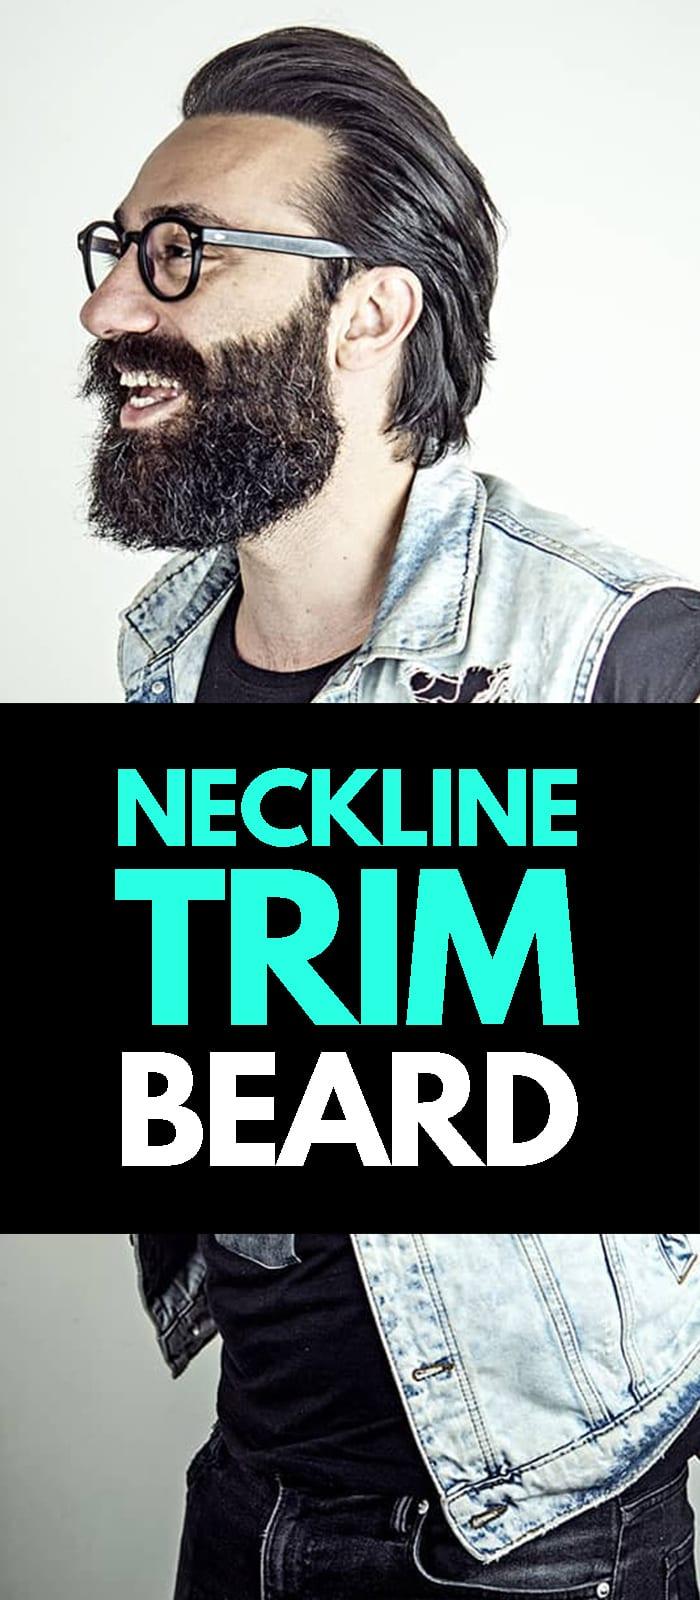 Neckline Trim Beard.